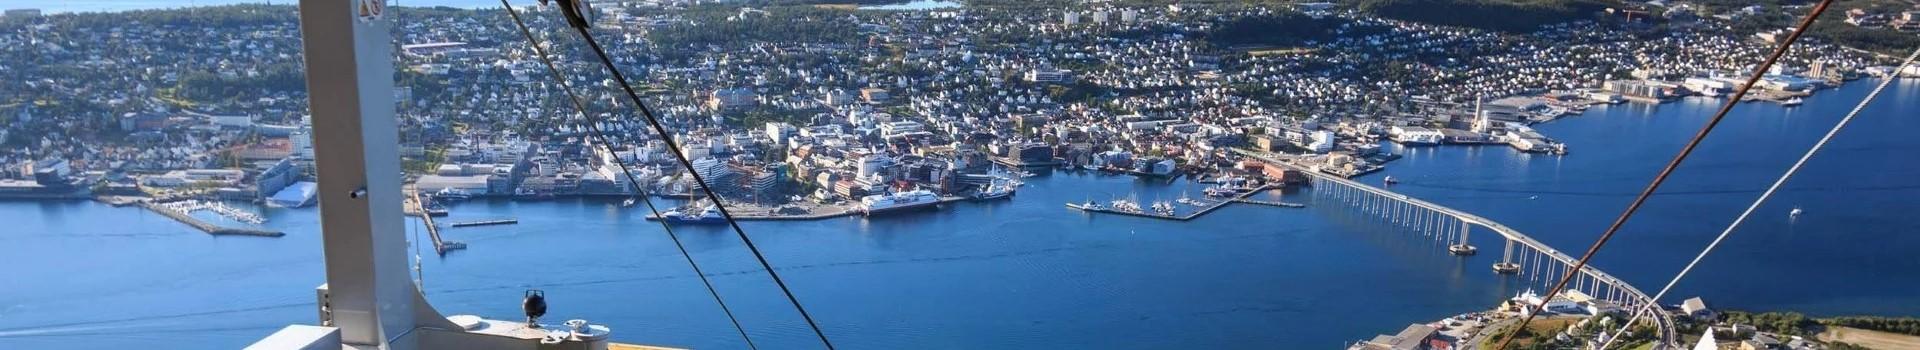 Tromsoe mit Seilbahn